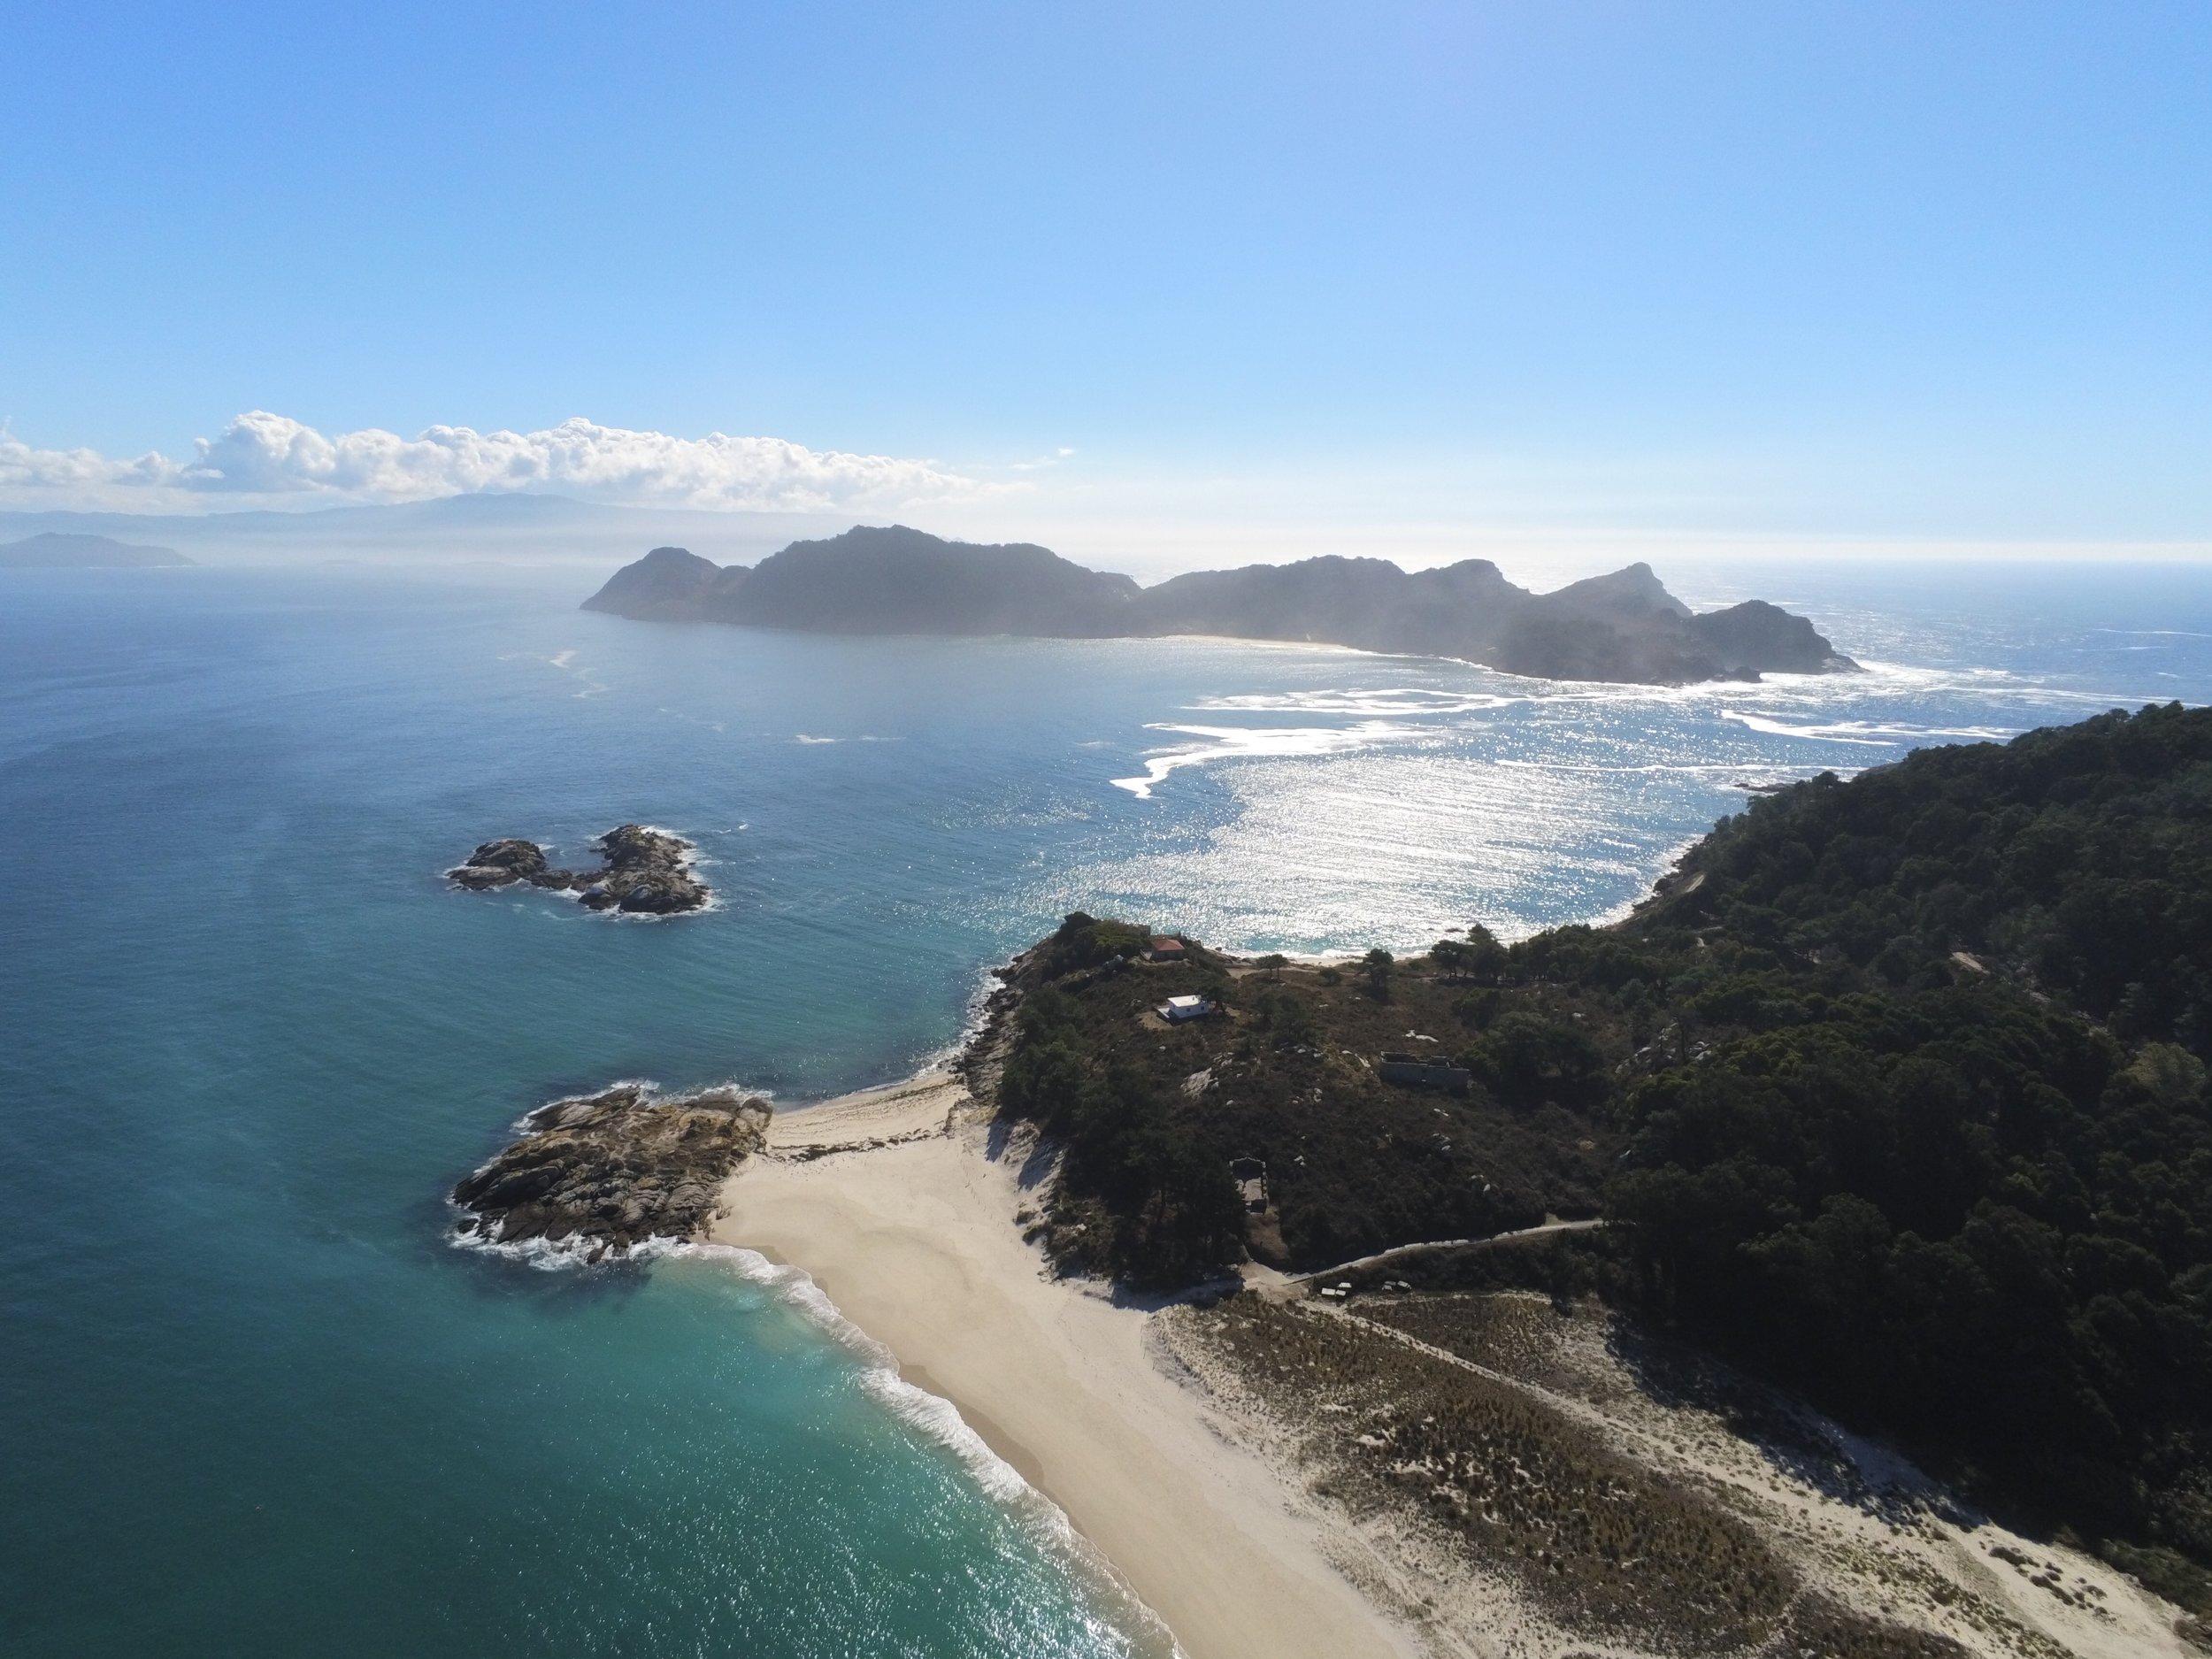 Playa de Rodas - ATLANTIC OCEAN - COAST OF SPAIN